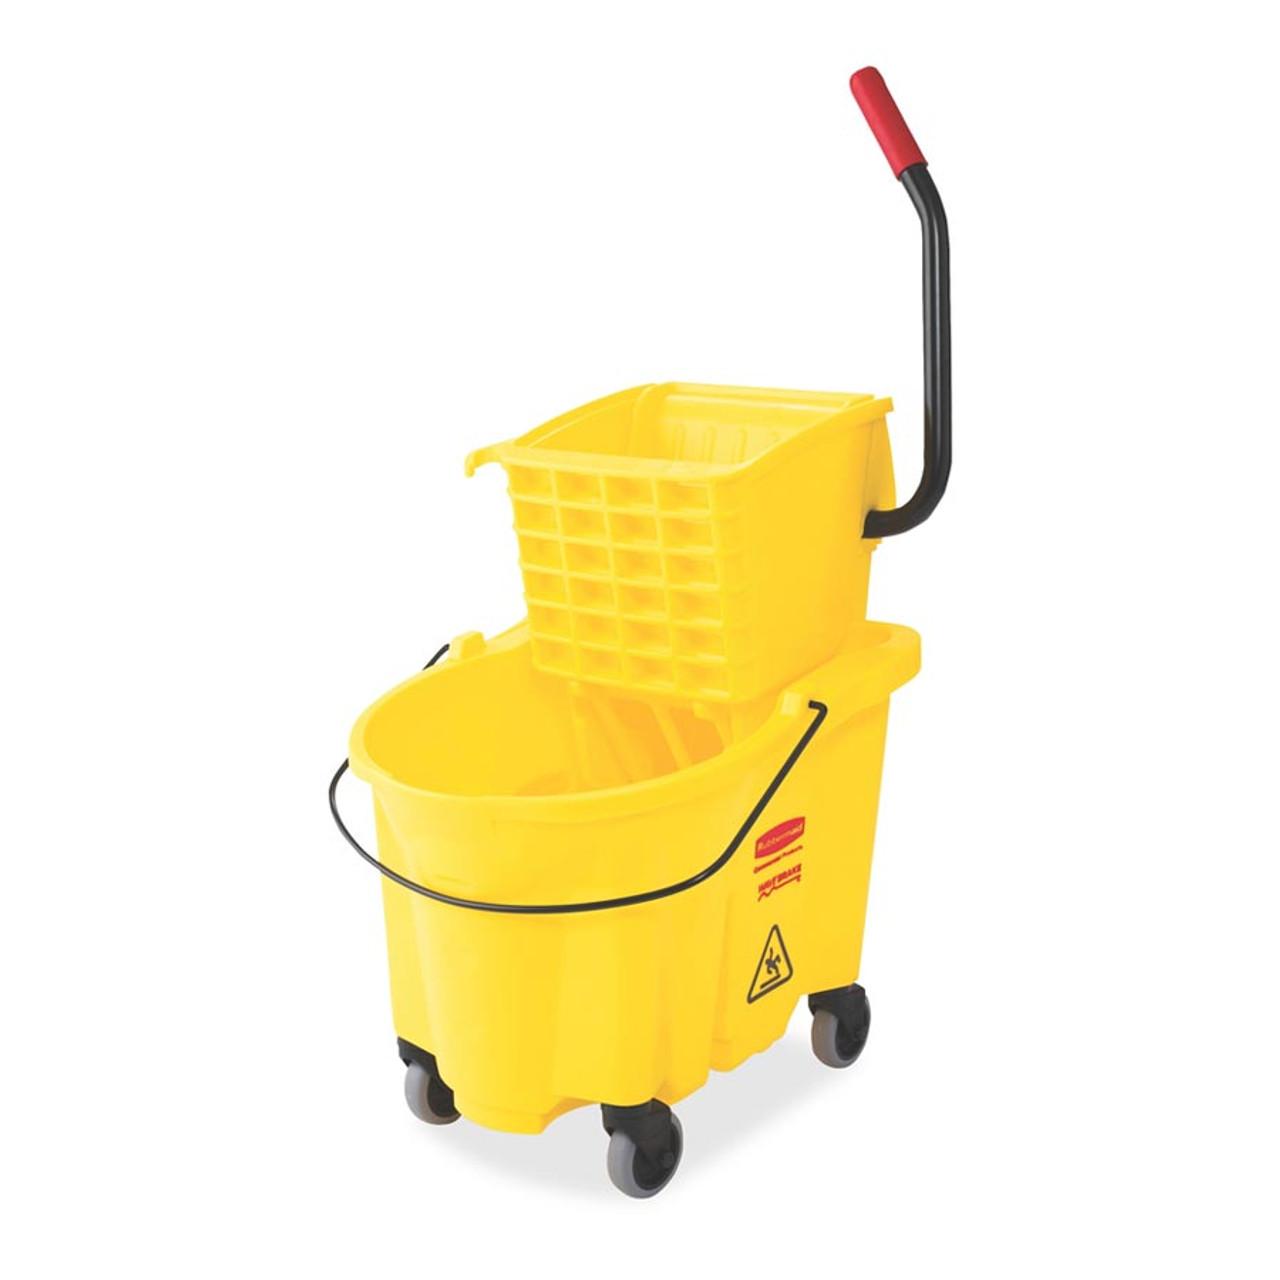 Rubbermaid Commercial WaveBrake 2 0 Bucket/Wringer Combos, Side-Press, 26  qt, Plastic, Yellow